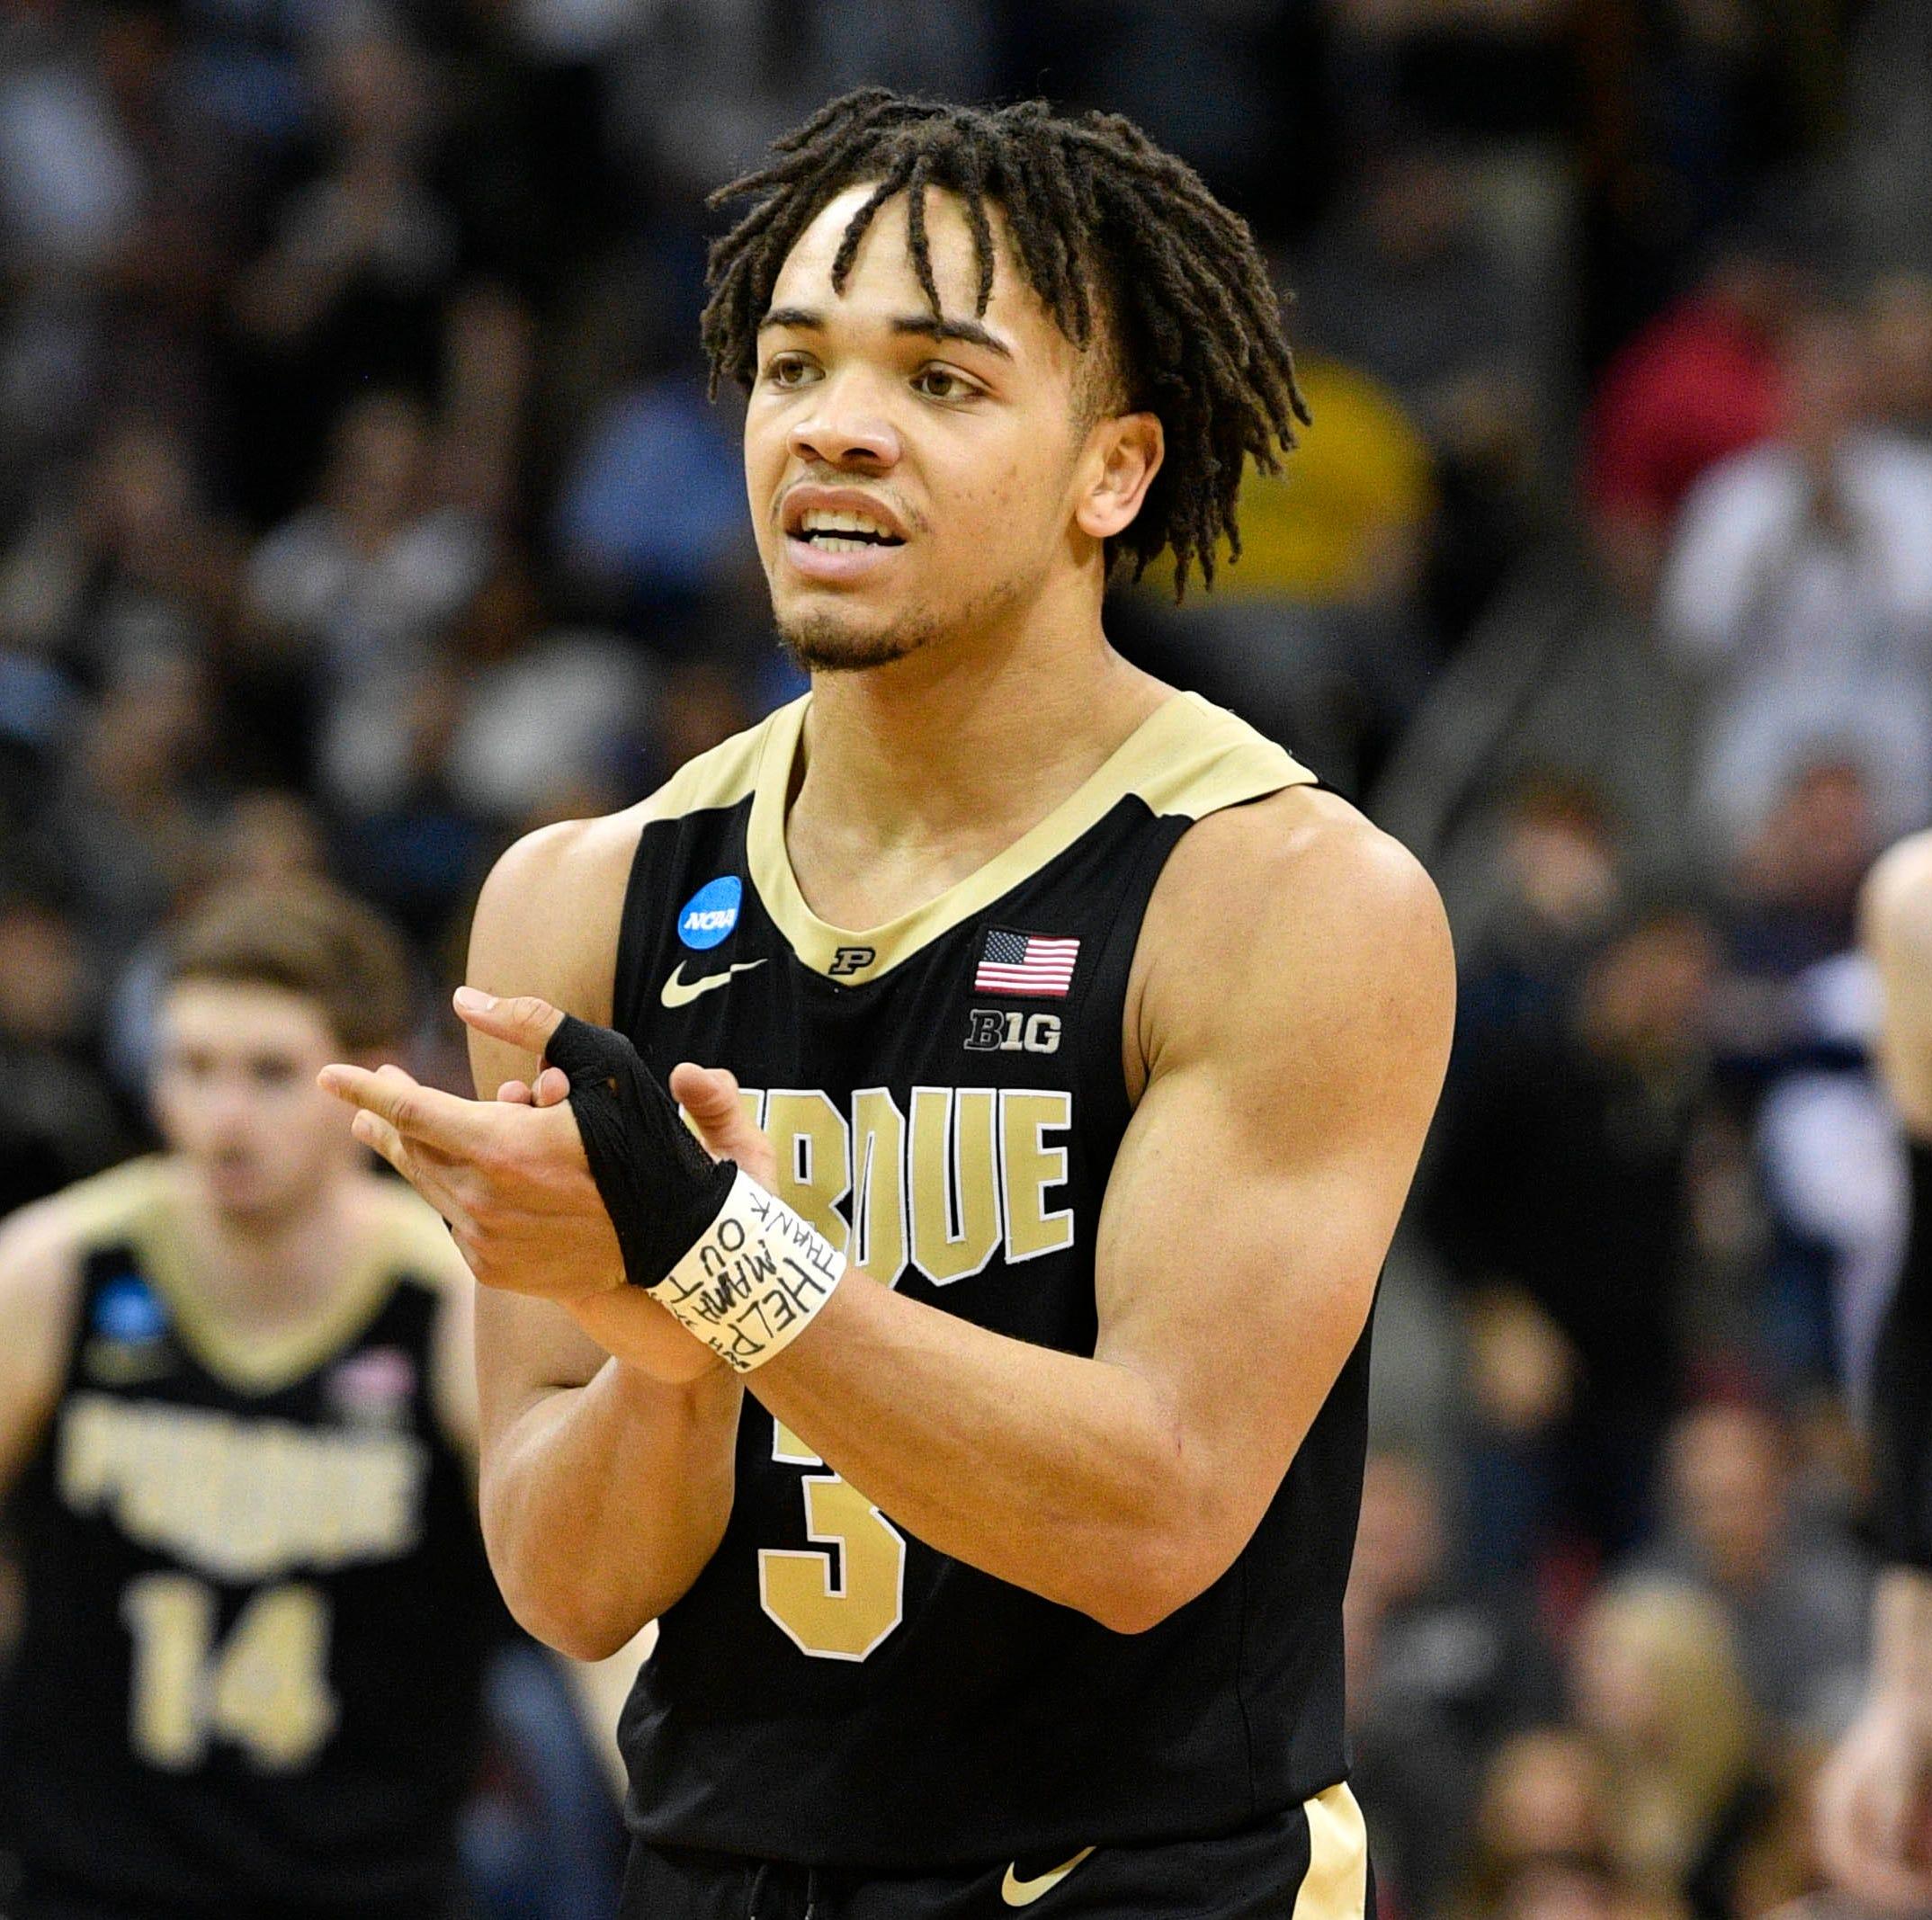 March Madness 2019: Purdue fans share heartbreak, anger in Elite Eight loss vs. UVA